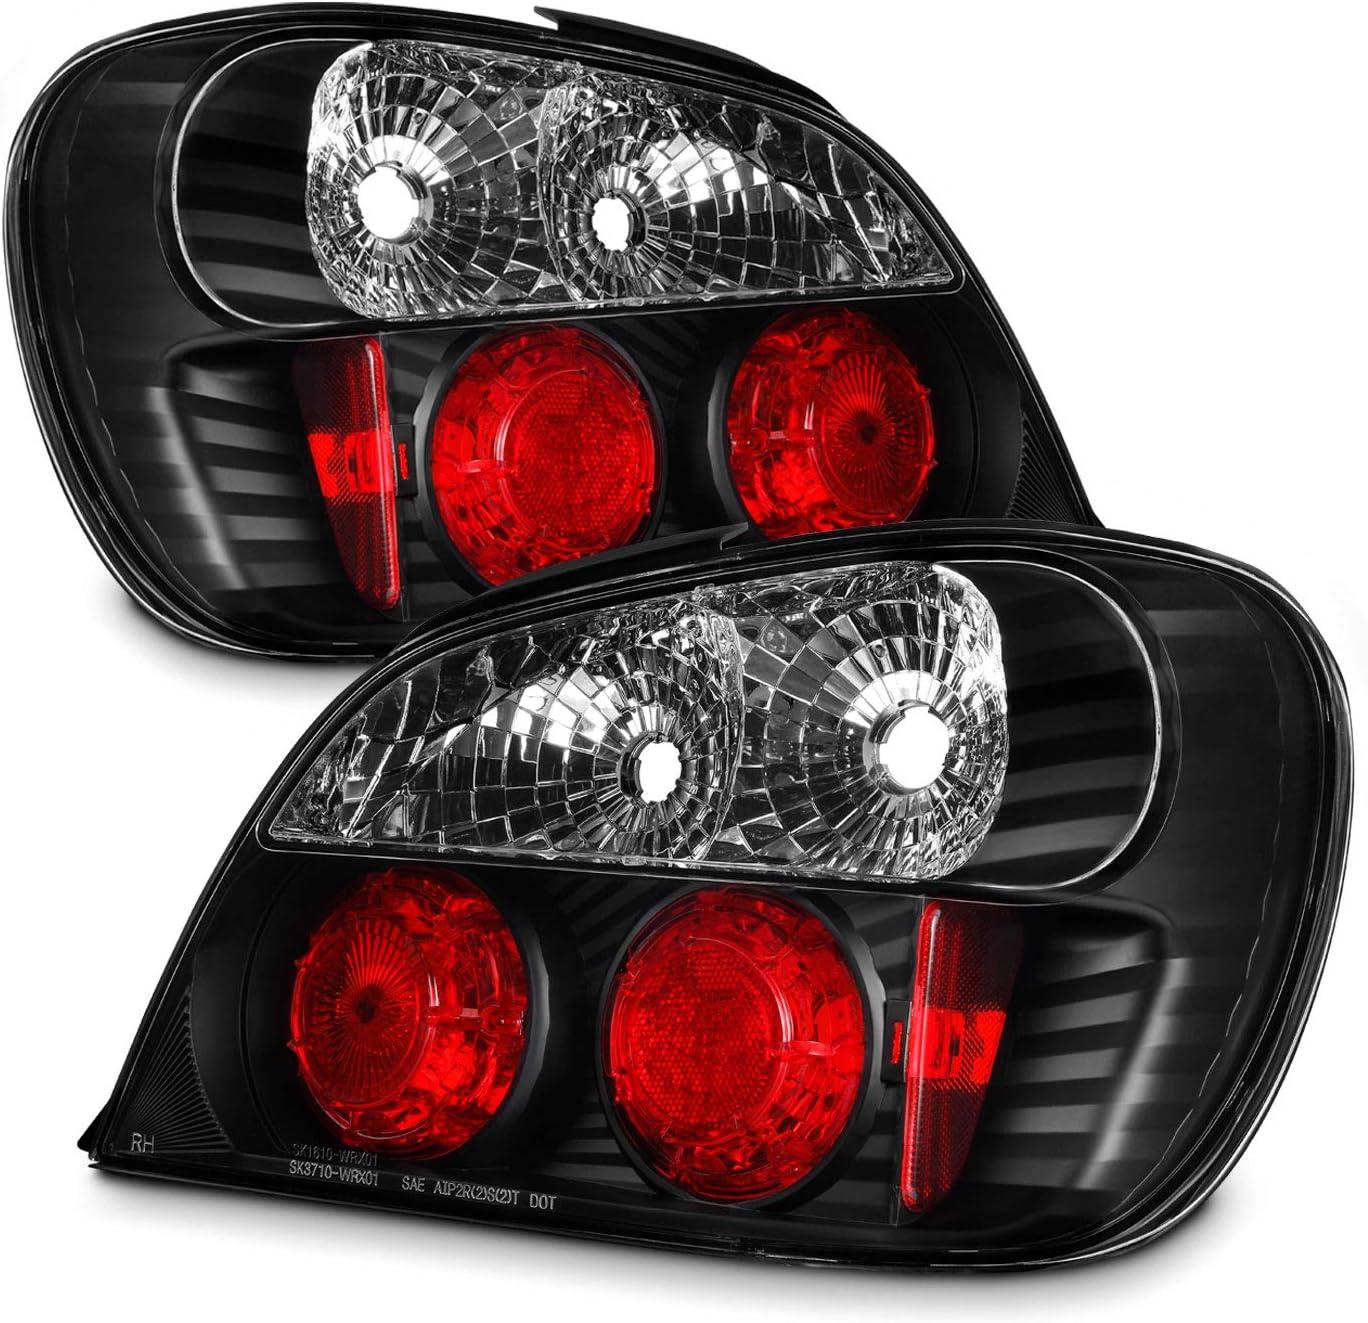 Subaru Impreza Bugeye Rear Lights Wagon left side passinger